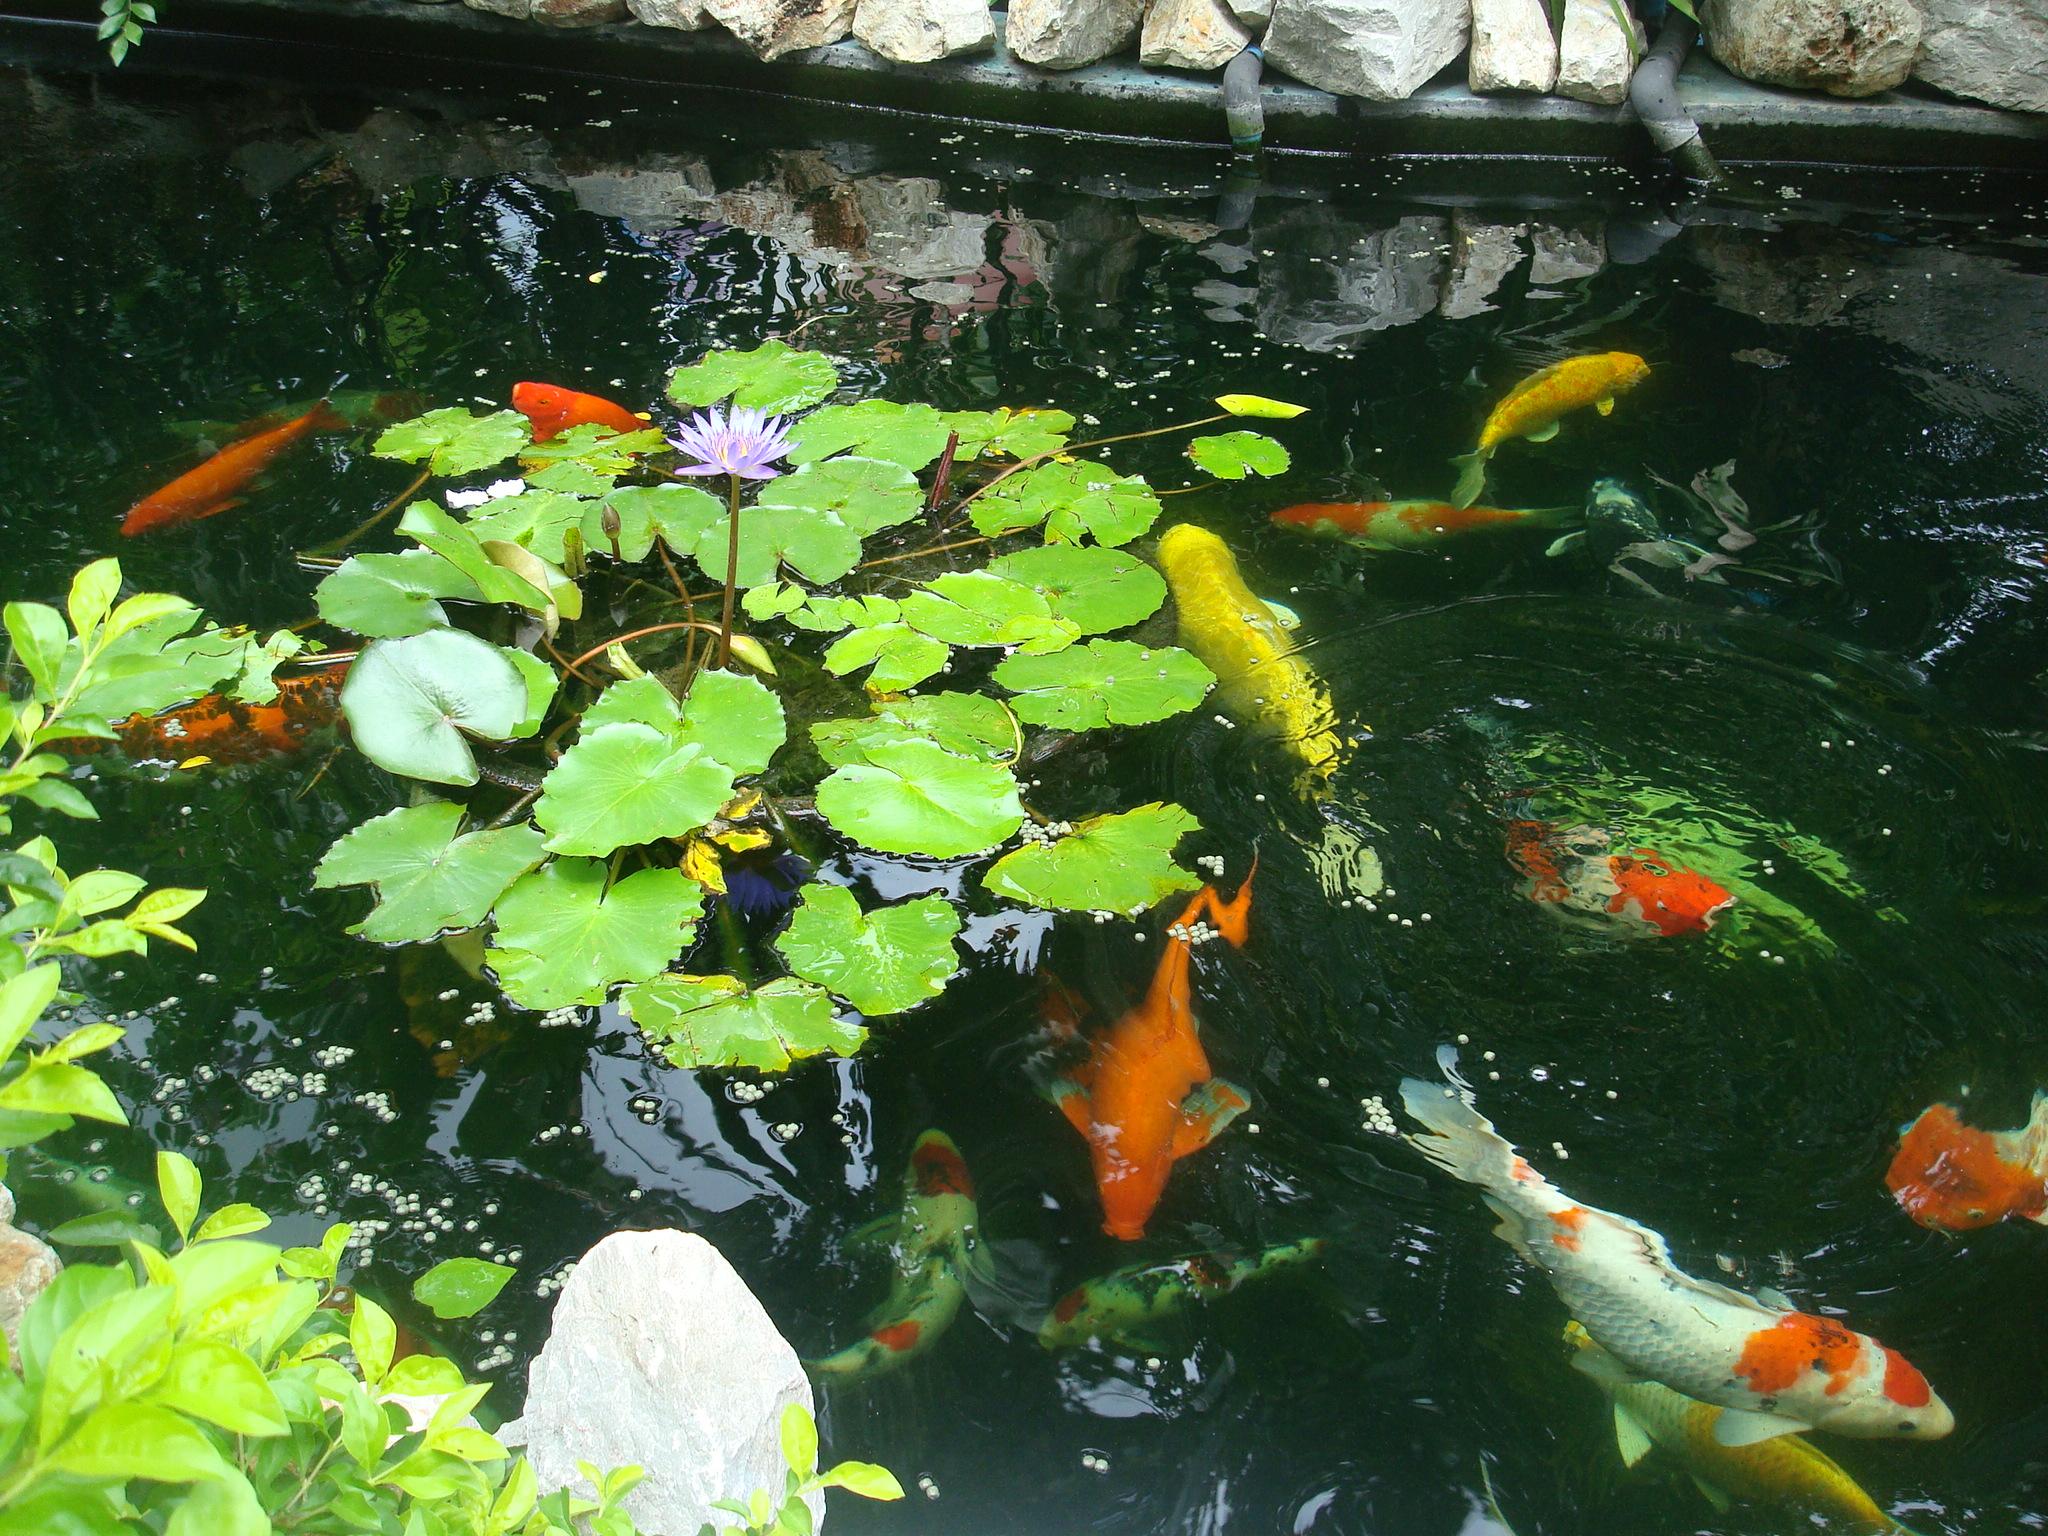 Koi ponds plants pets vets in thailand thailand forum for Koi pond forum